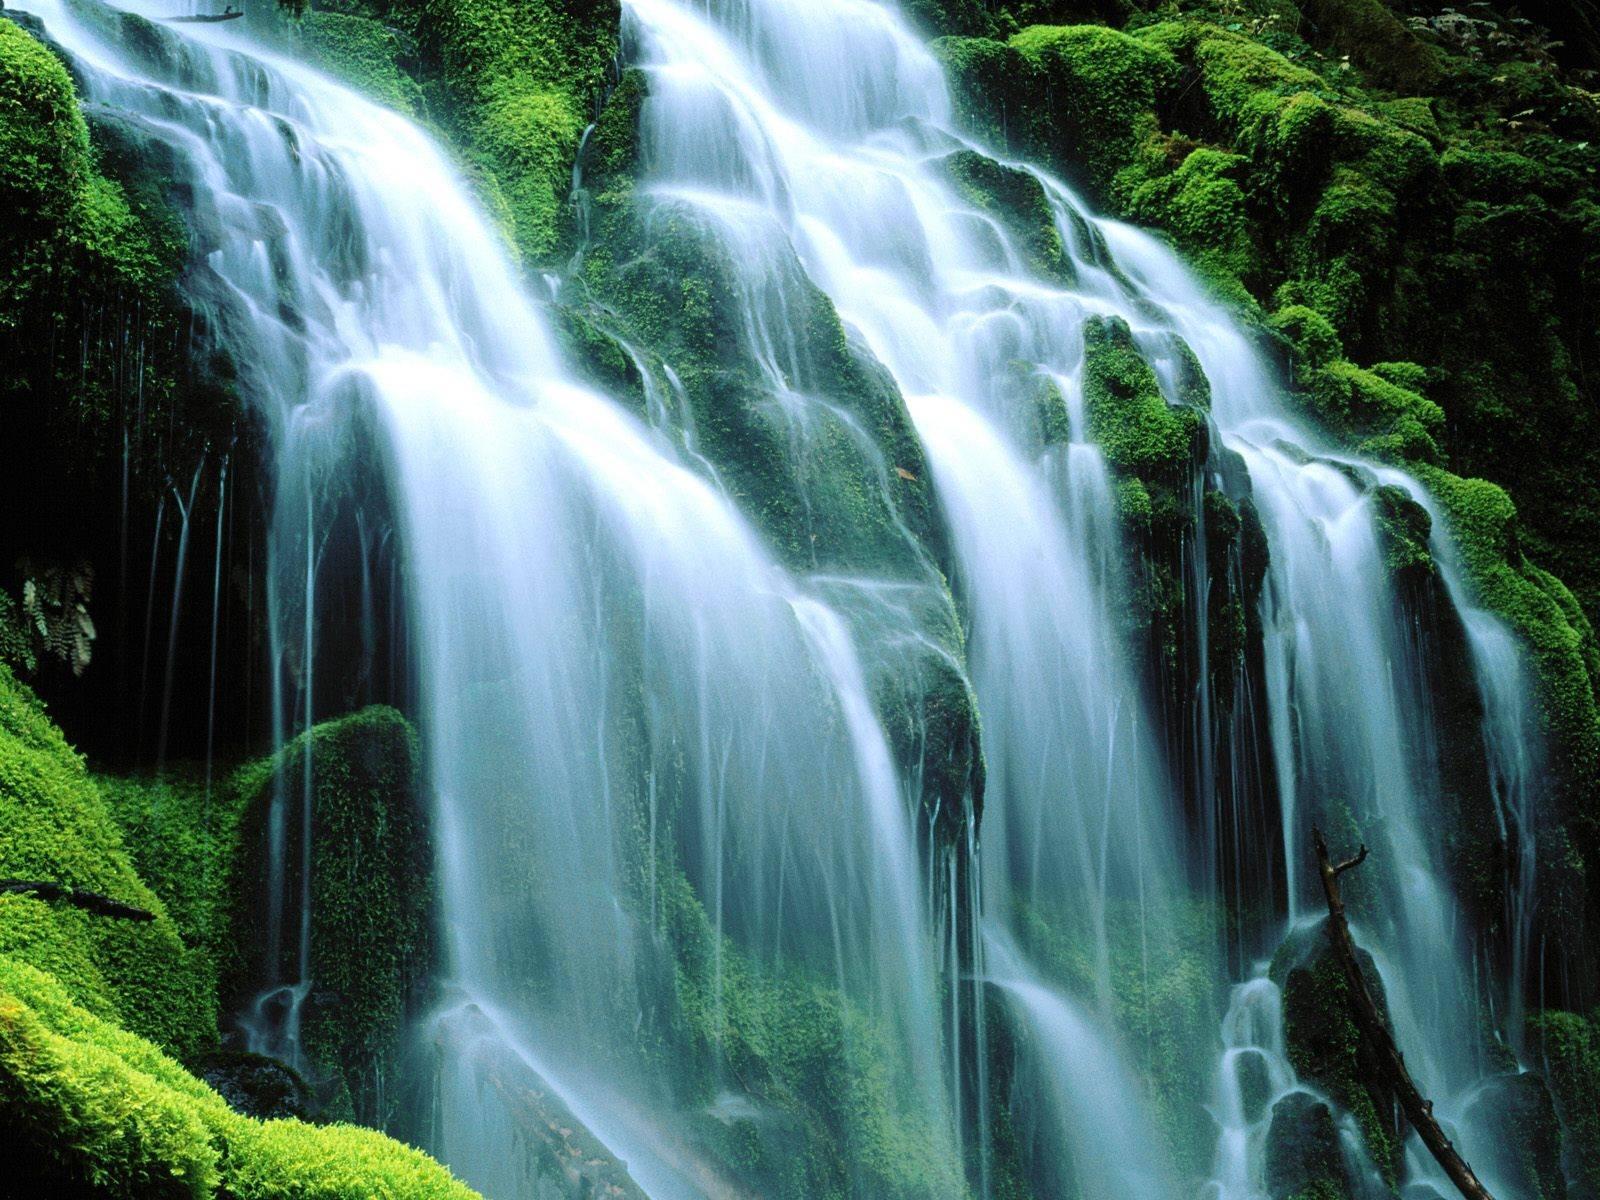 waterfall wallpapers nature hd - HD Desktop Wallpapers | 4k HD